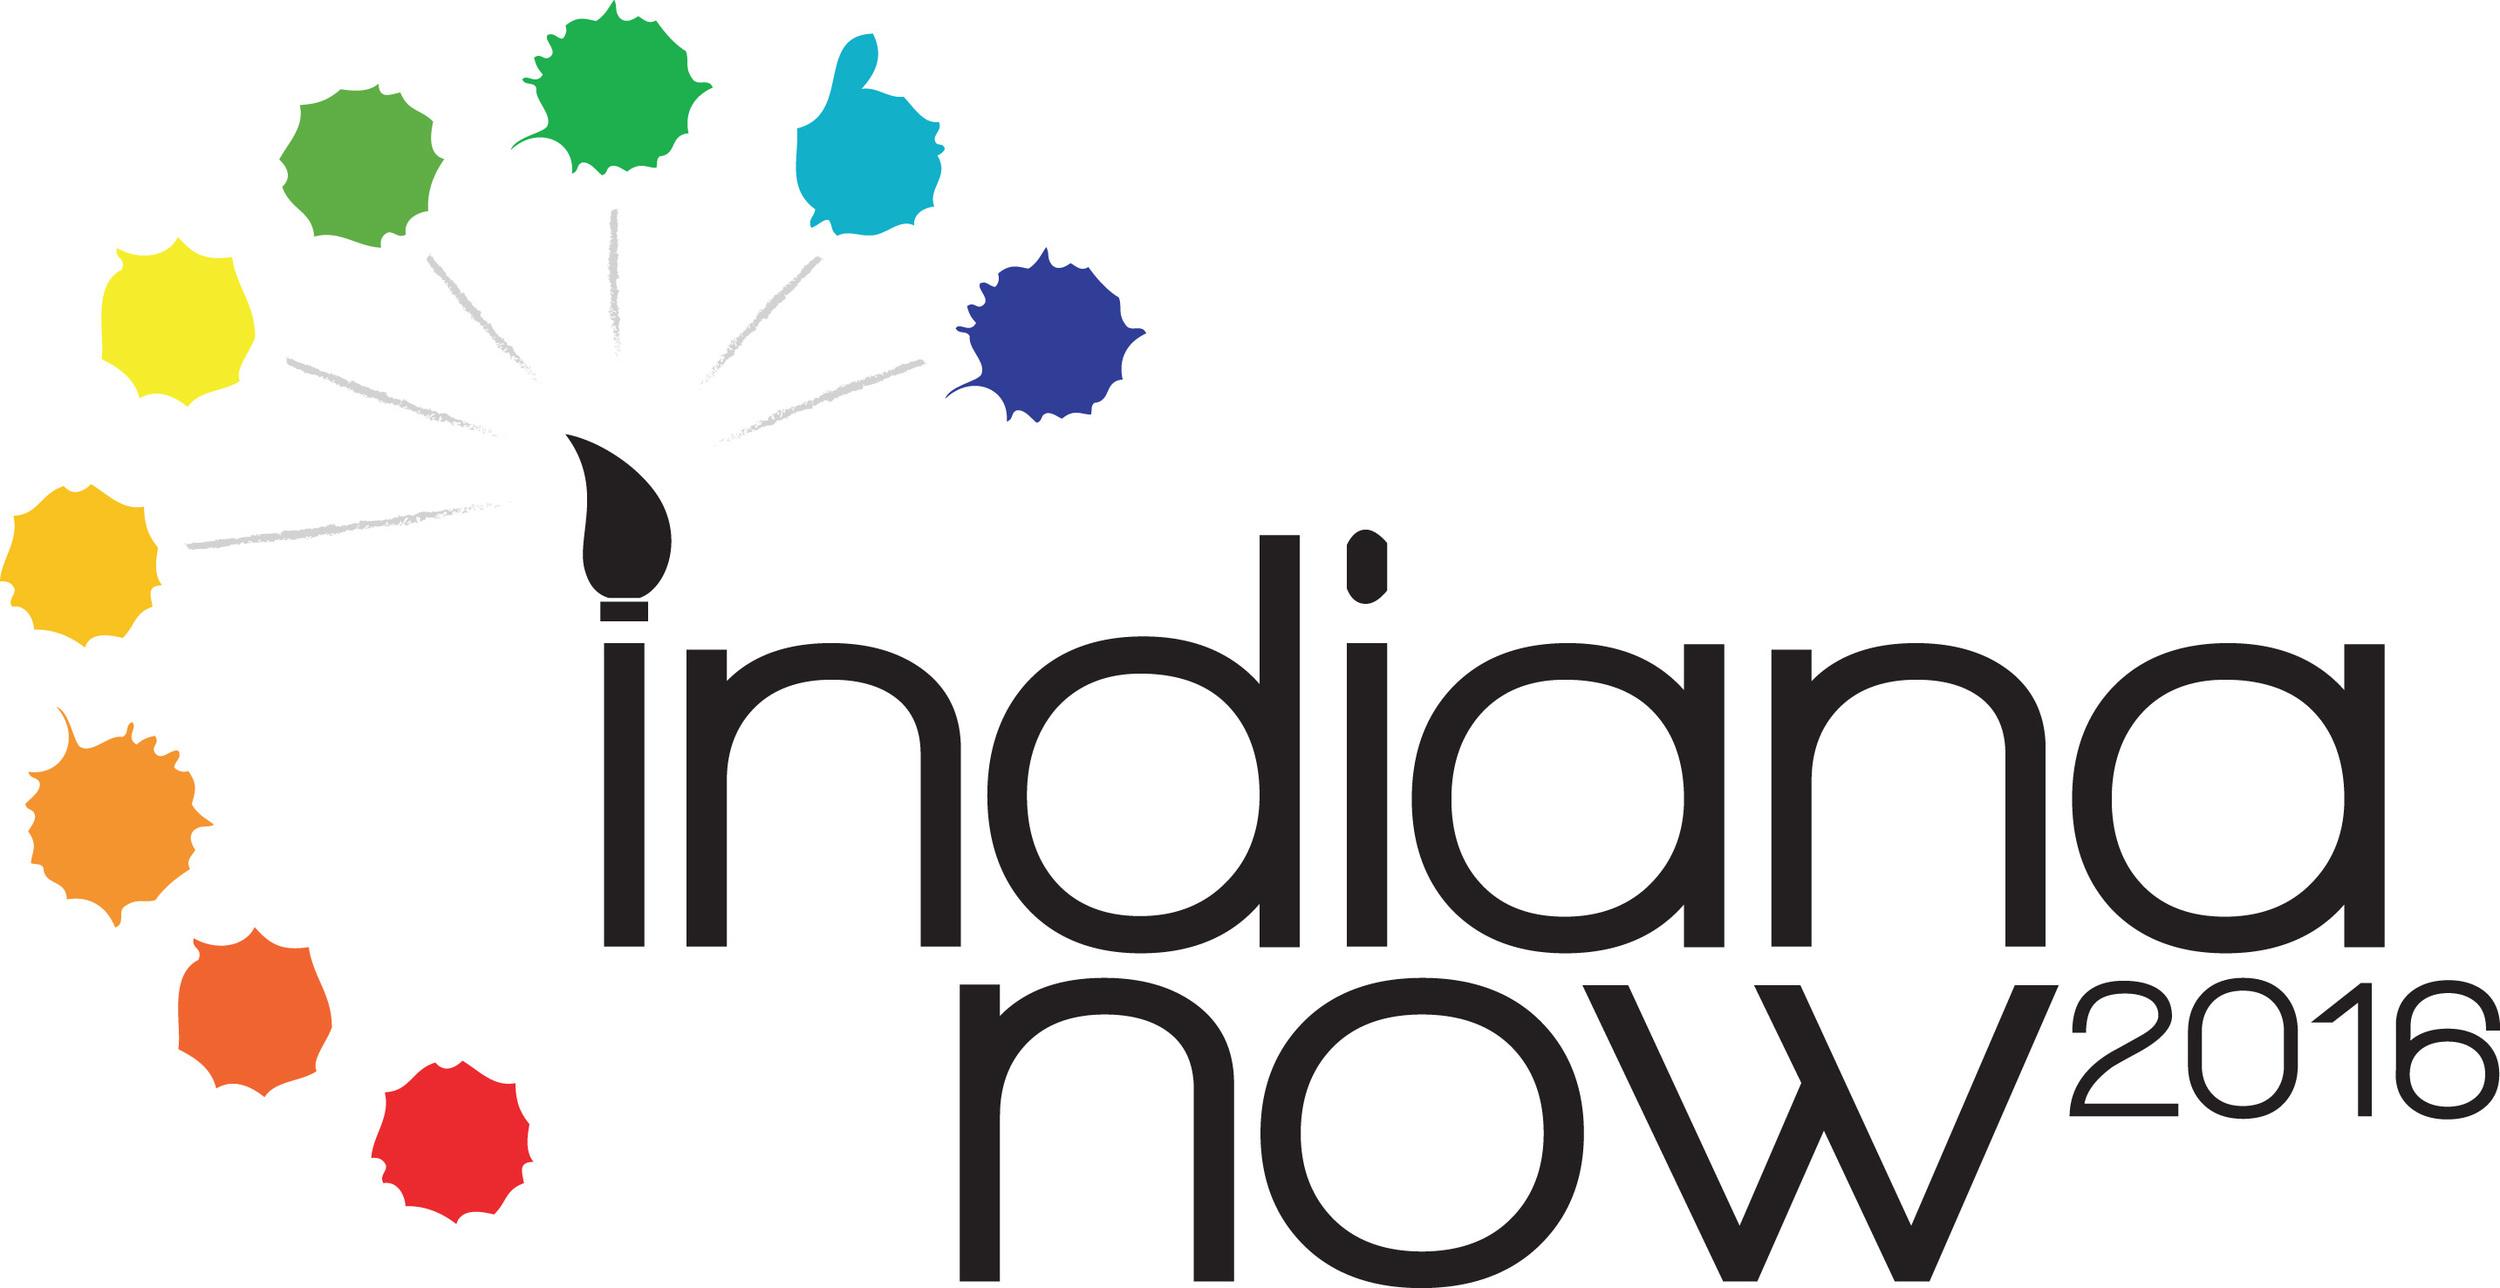 Indiana Now 2016 logo.jpg